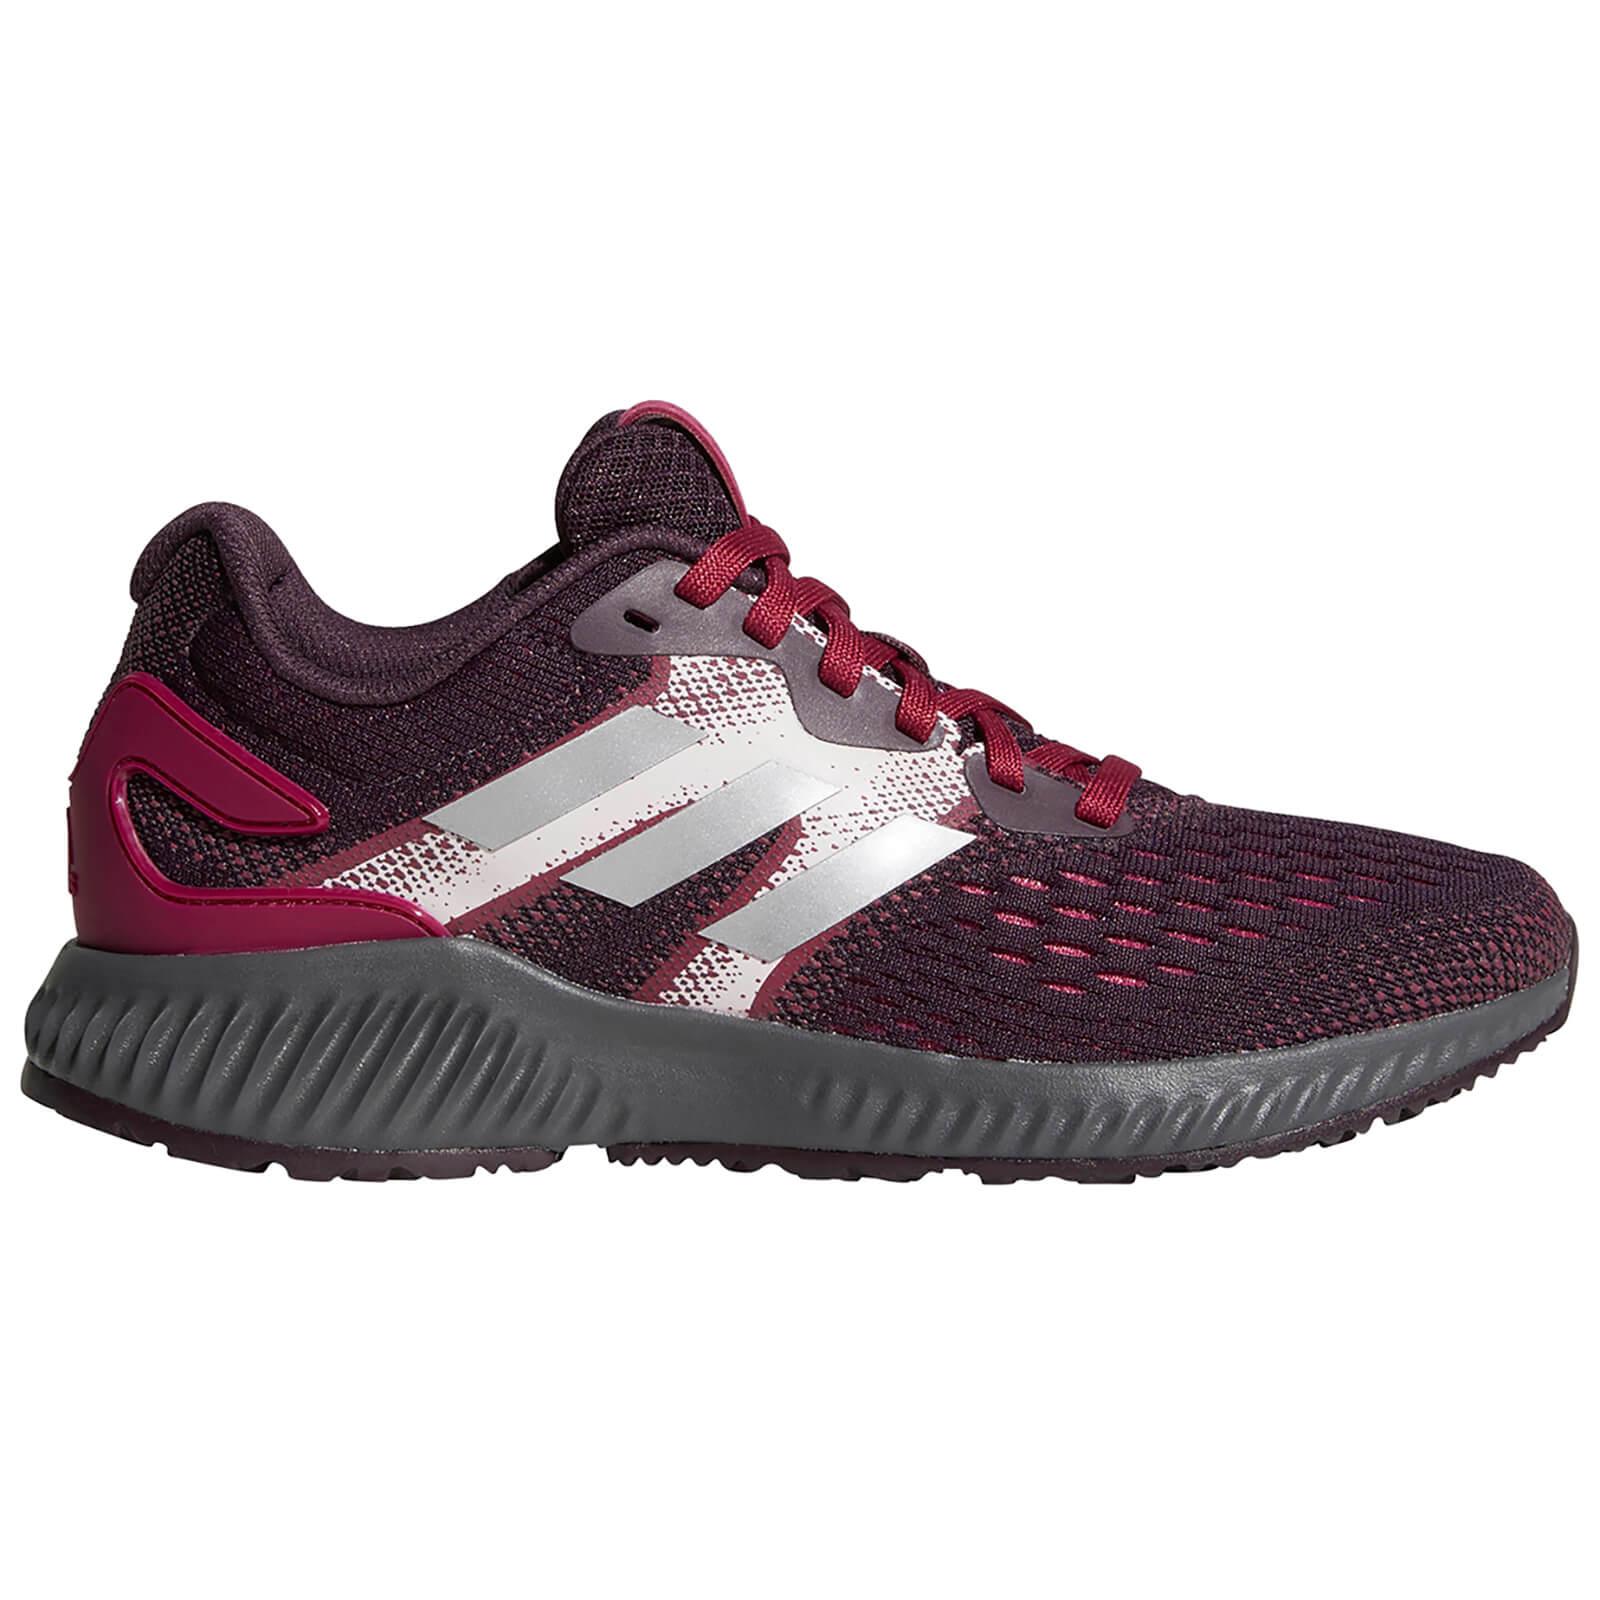 adidas Women's Aerobounce Training Shoes - Purple - US 7/UK 5.5 - Purple